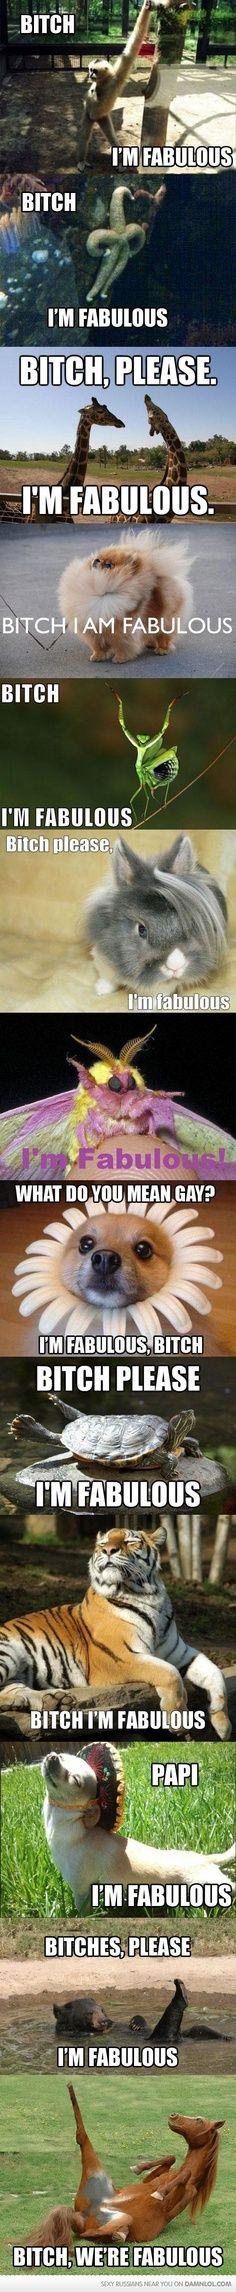 B*itch I'm Fabulous... Animal Edition